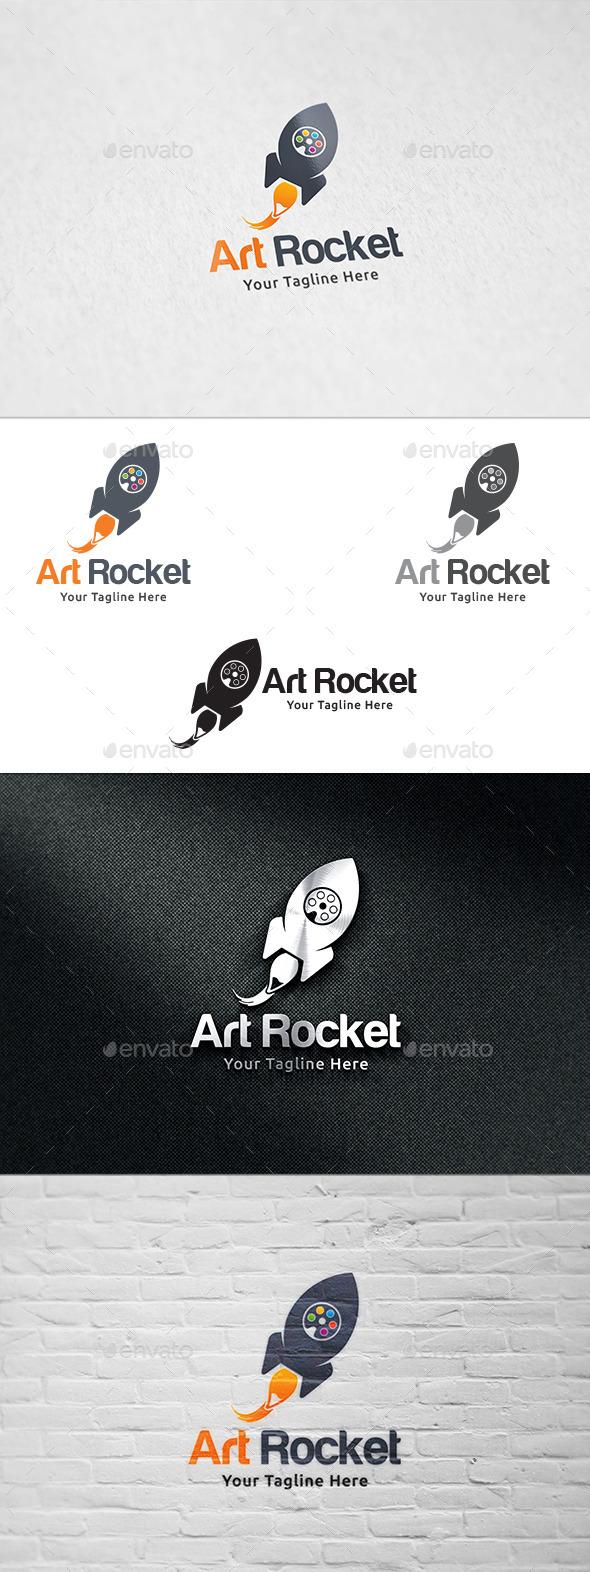 Art Rocket - Logo Design